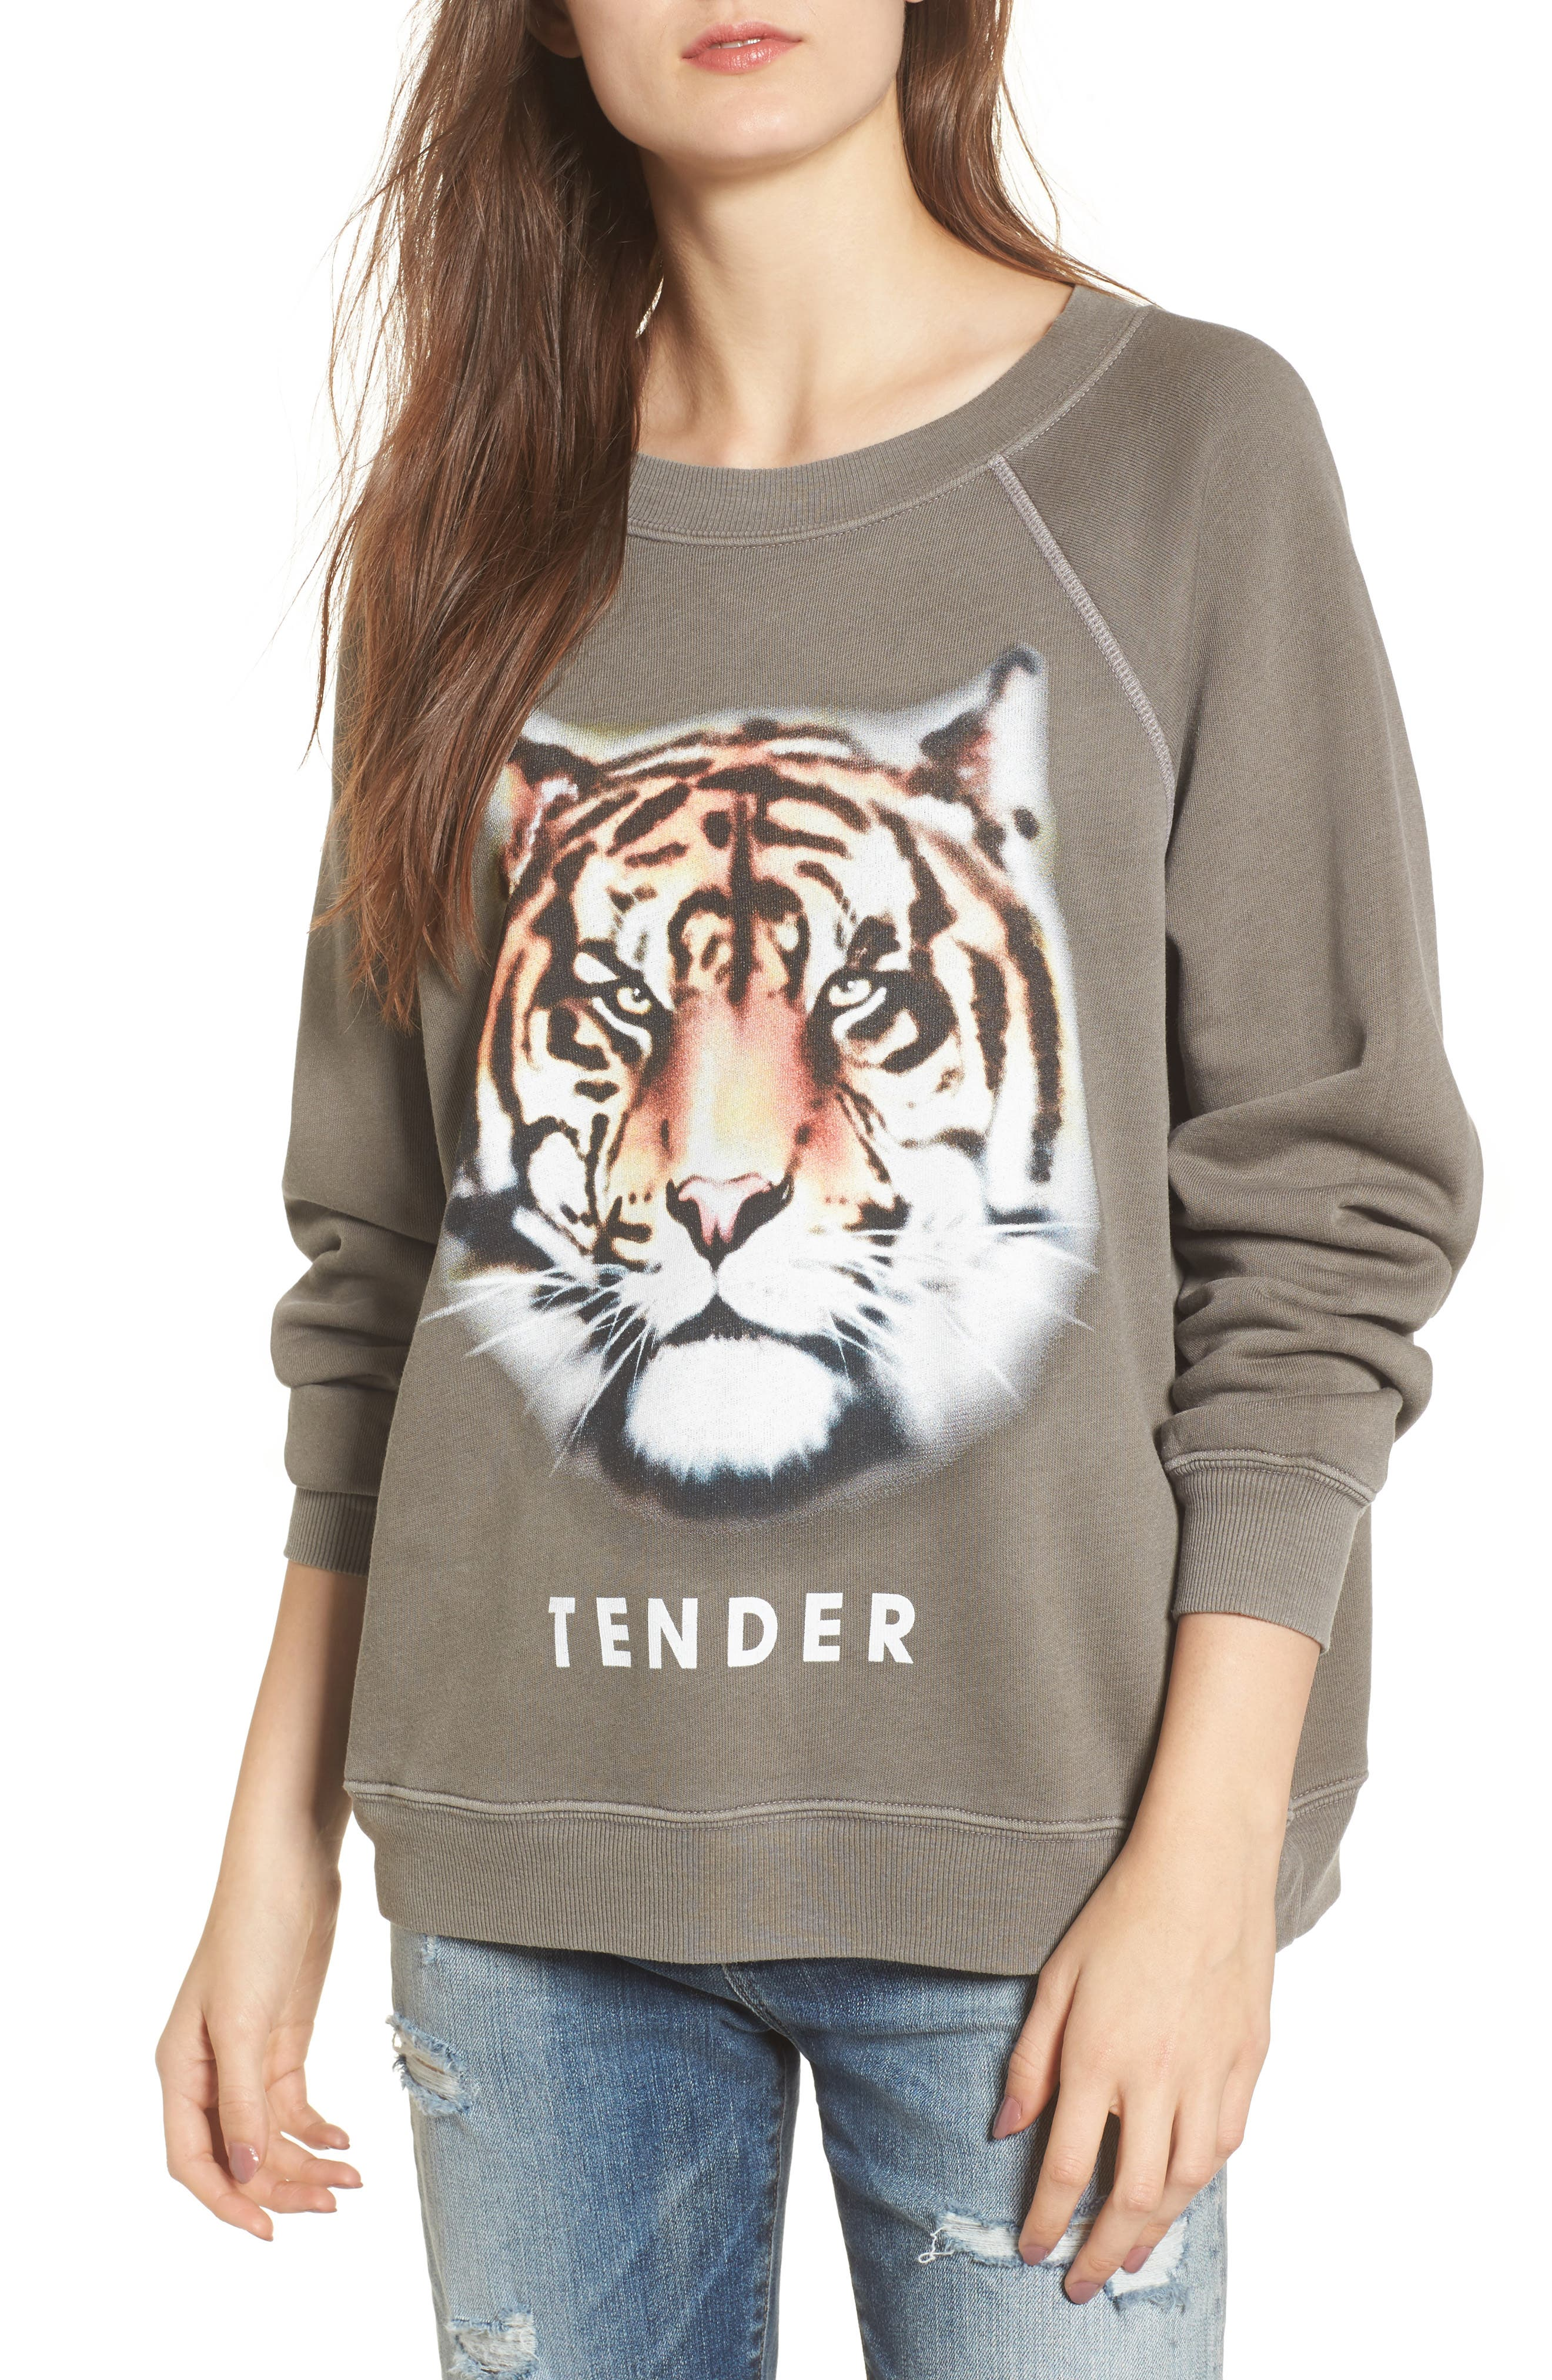 Main Image - Wildfox Tender - Sommers Sweatshirt